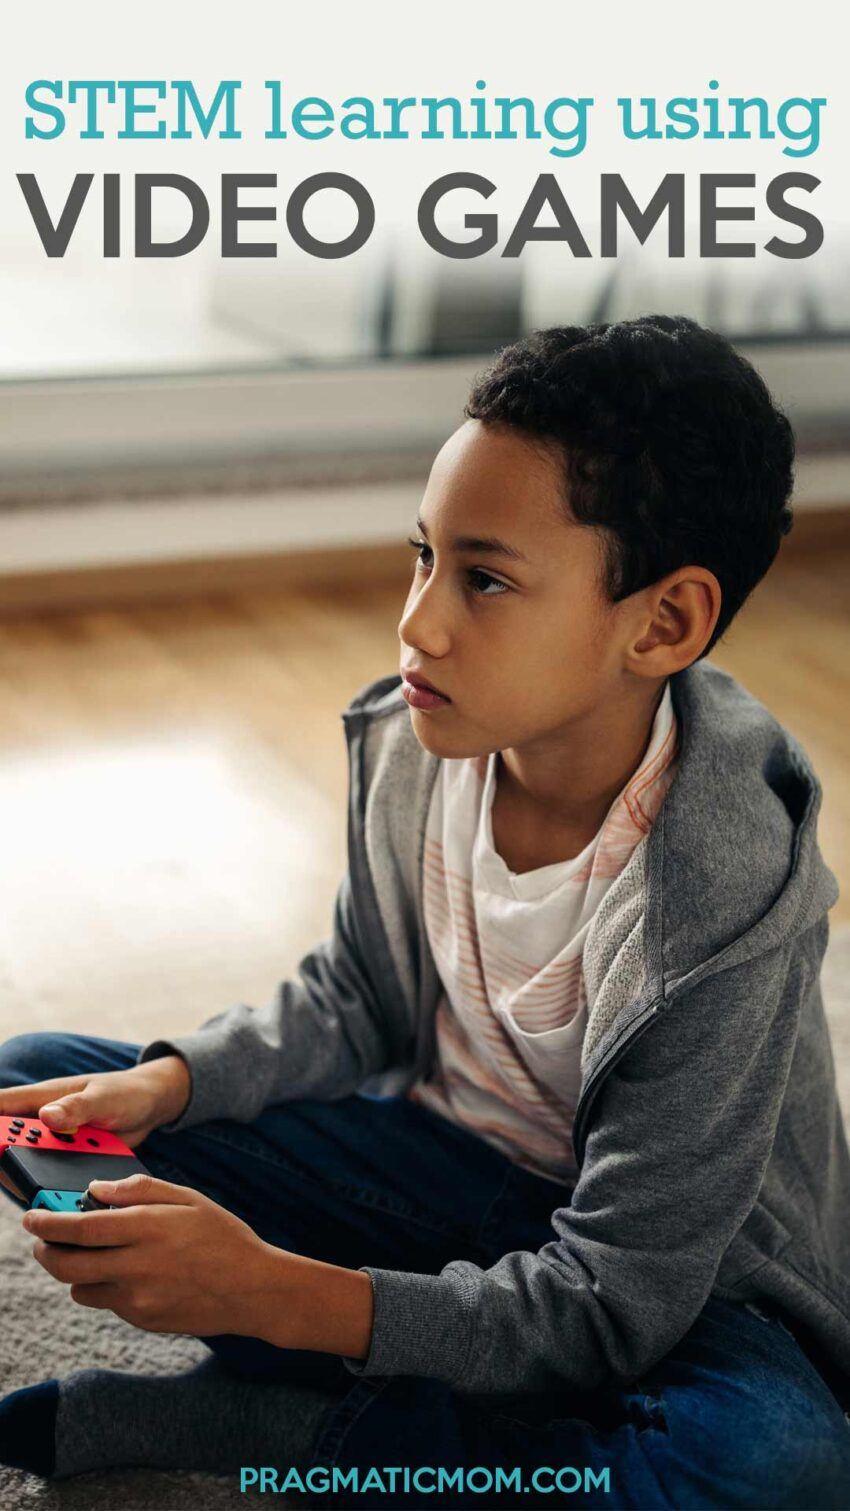 Video Games for STEM Summer Learning